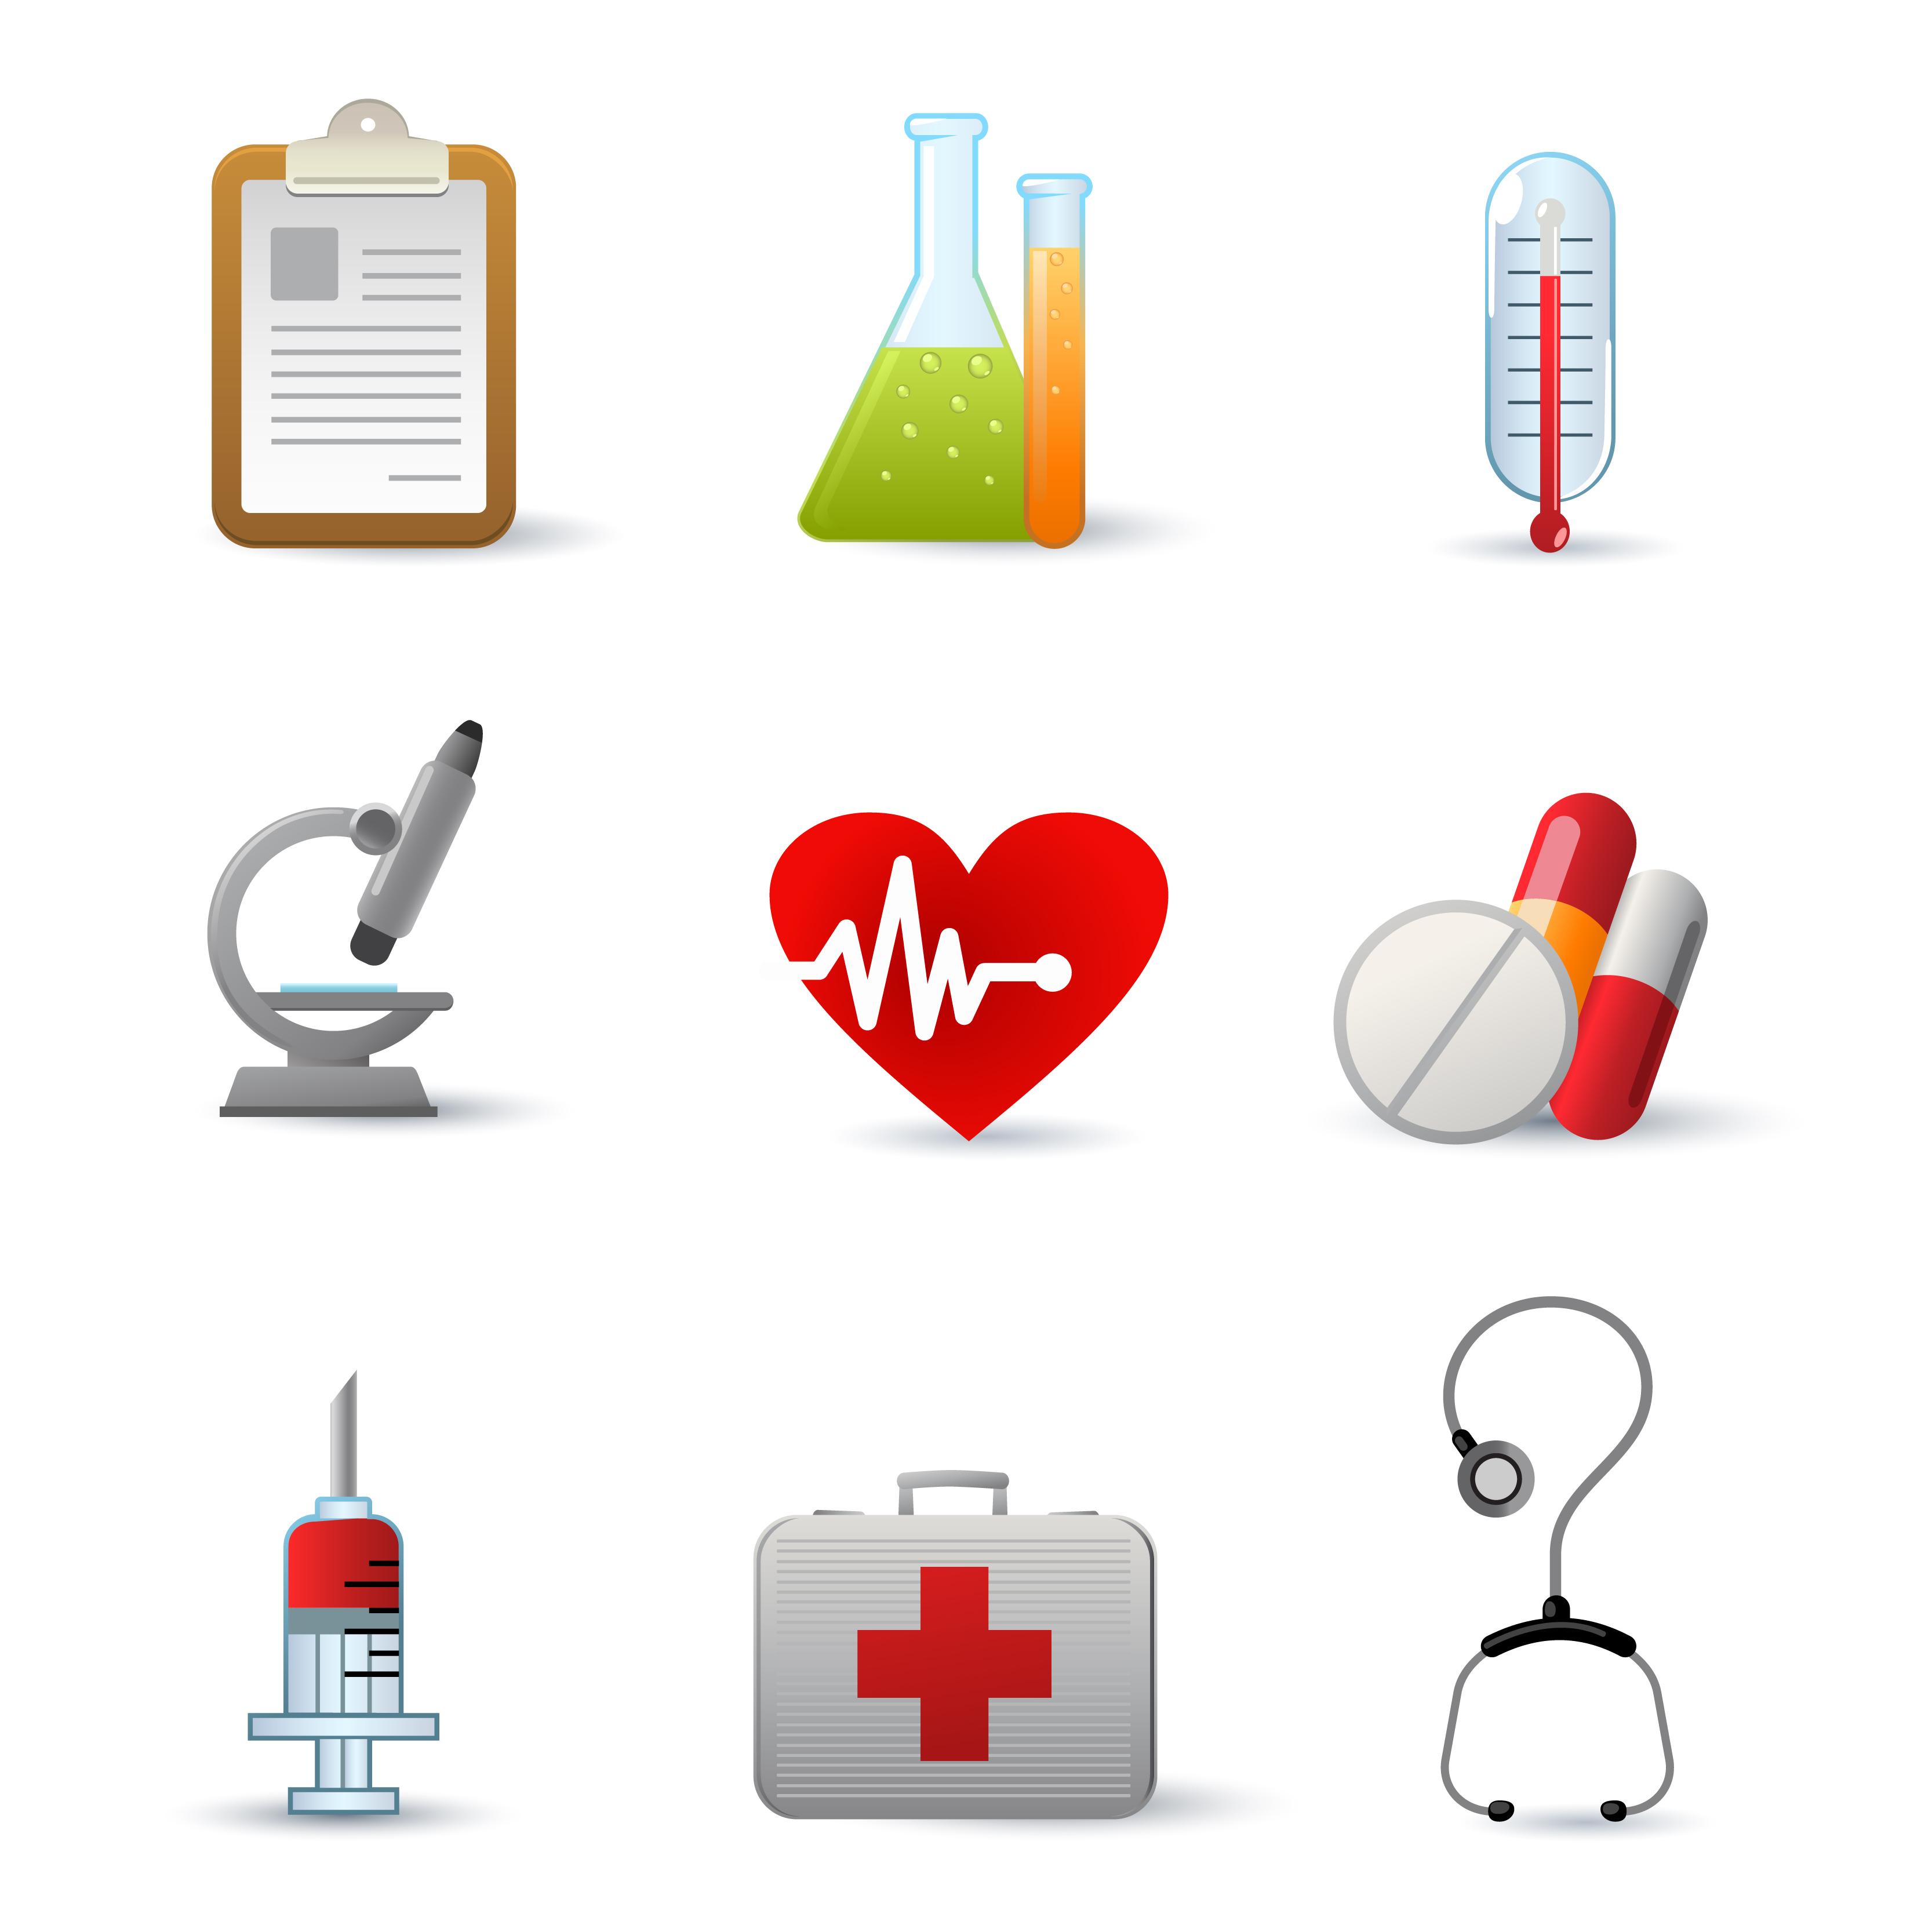 Medical Vector Images at GetDrawings.com.